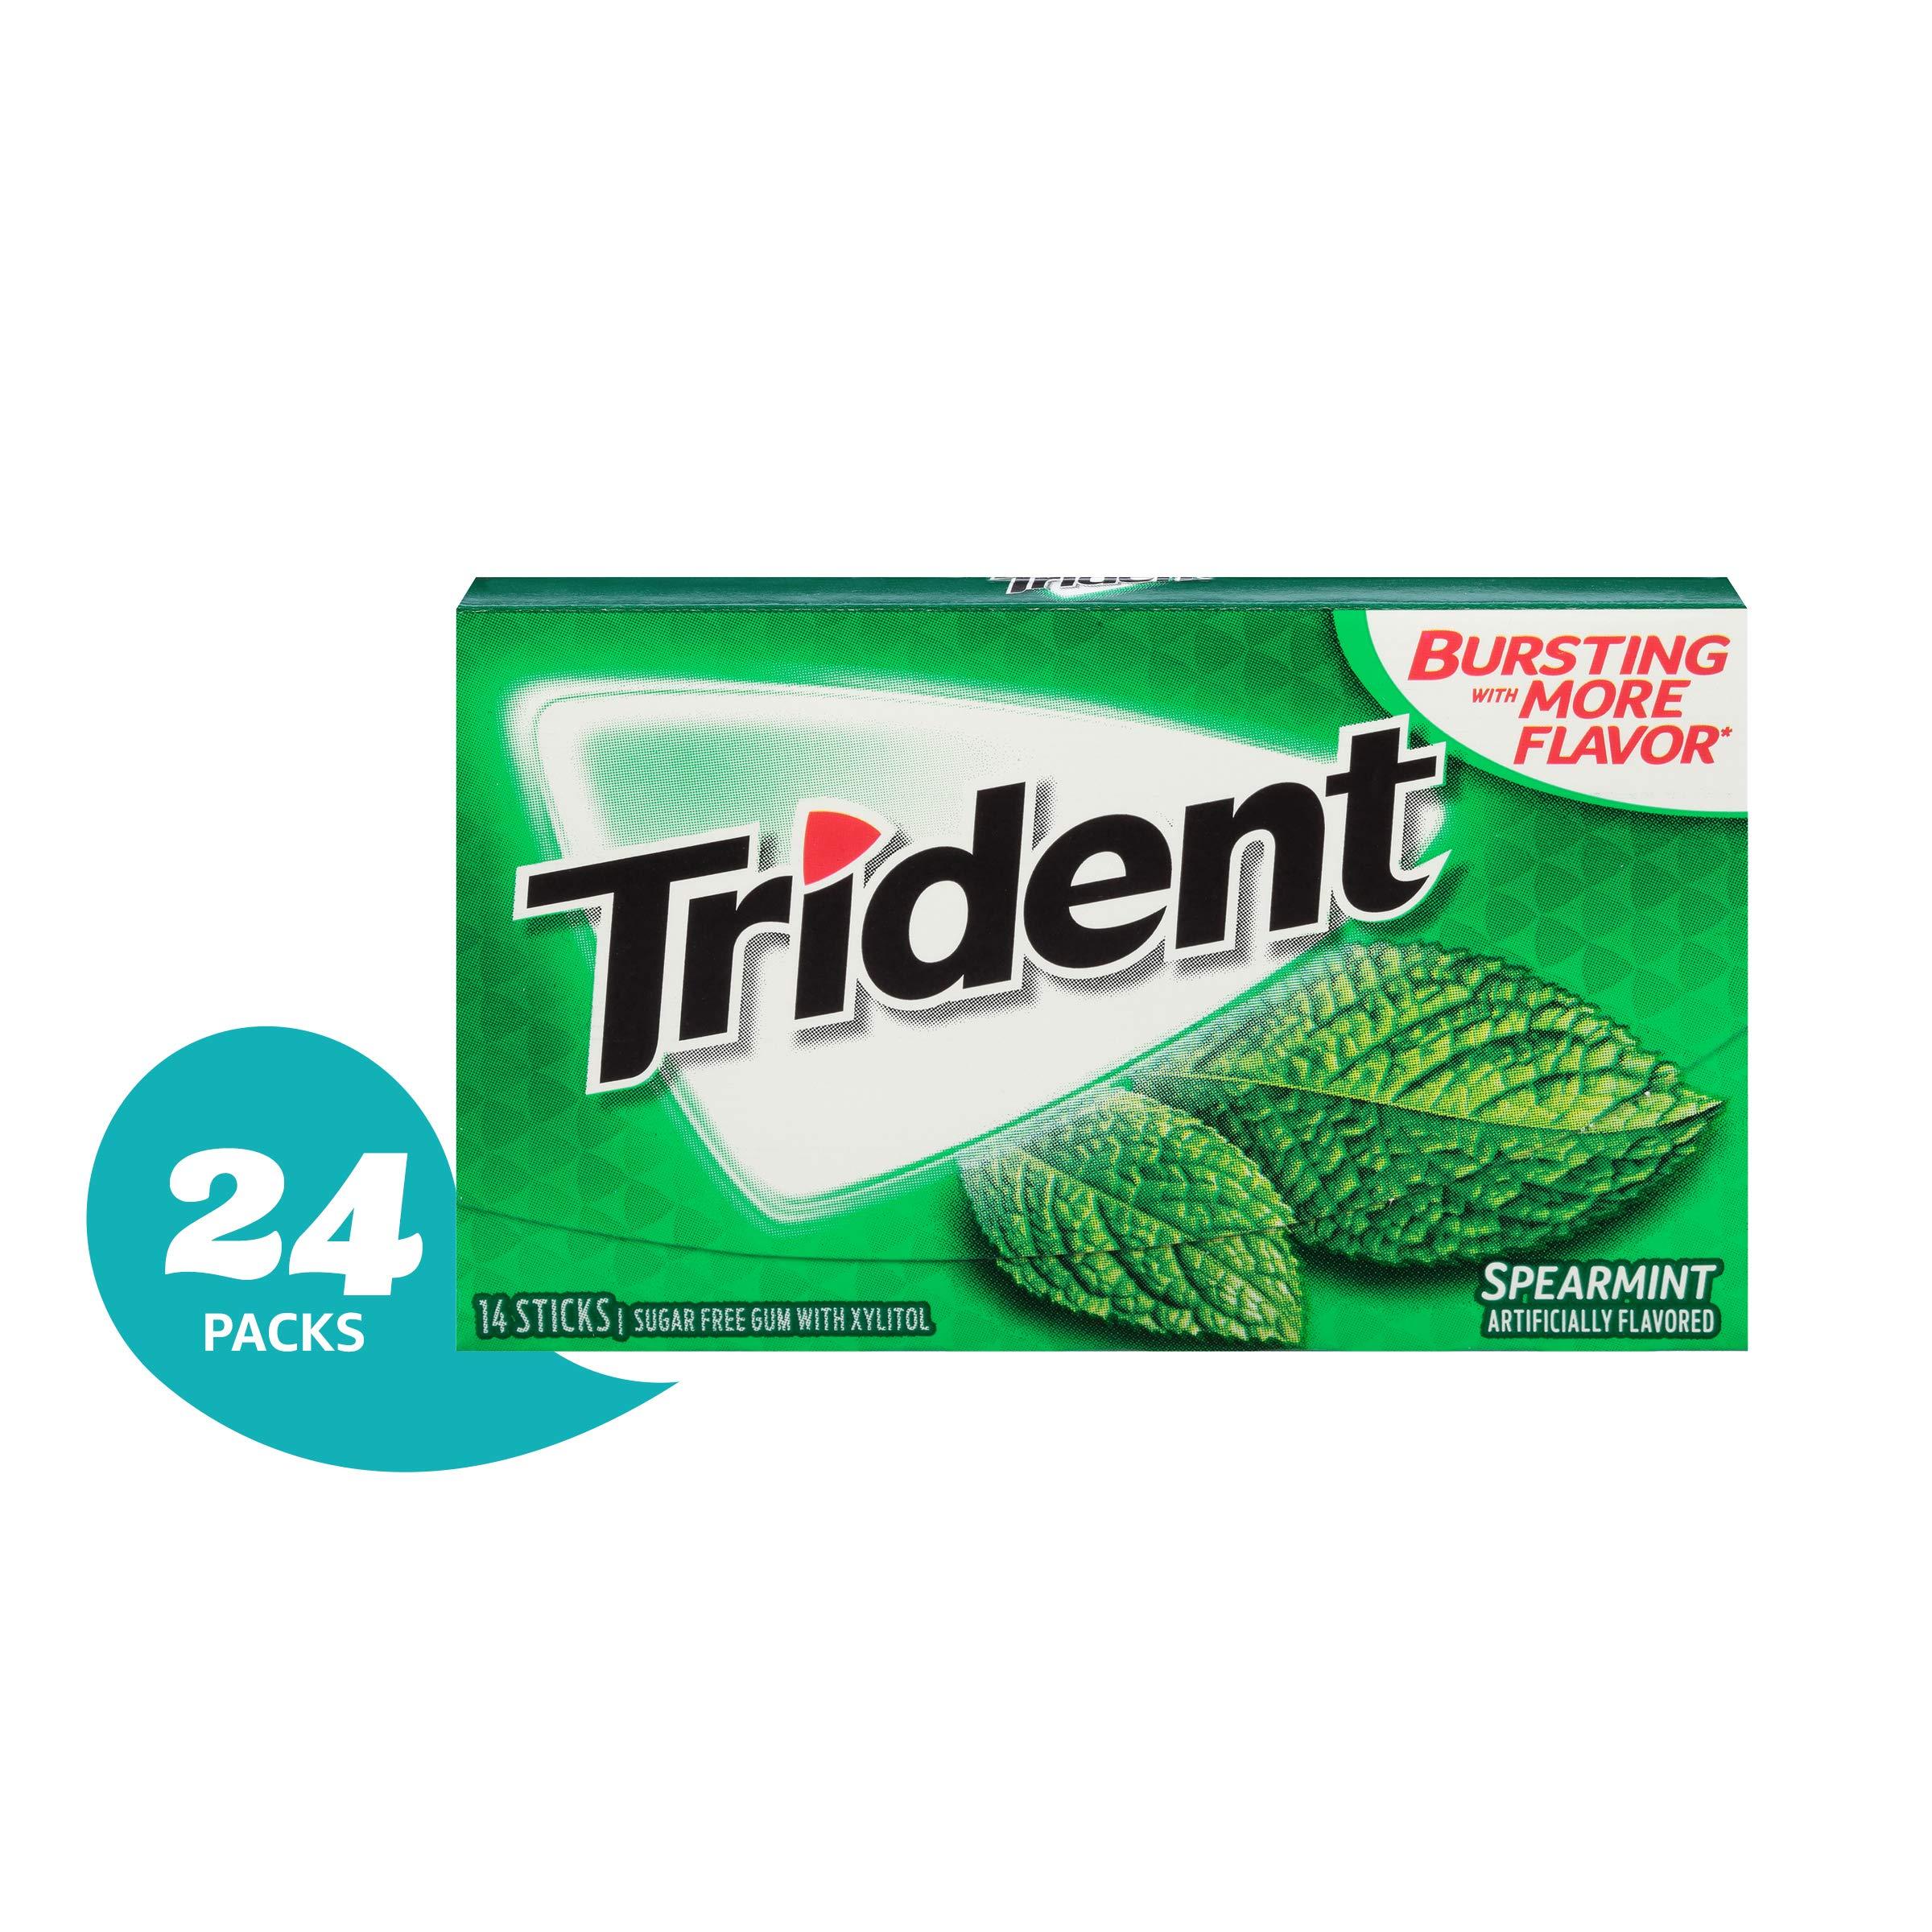 Trident Spearmint Sugar Free Gum - 24 Pack (336Piece Total)